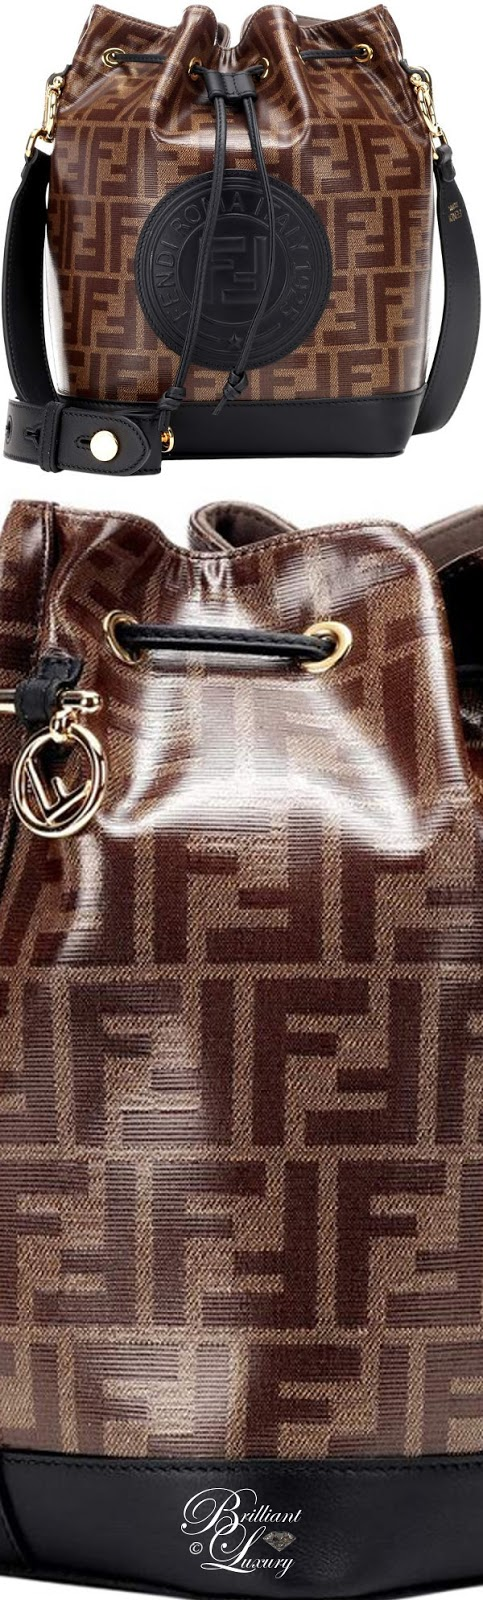 Brilliant Luxury ♦ Fendi Mon Trésor Small Bucket Bag